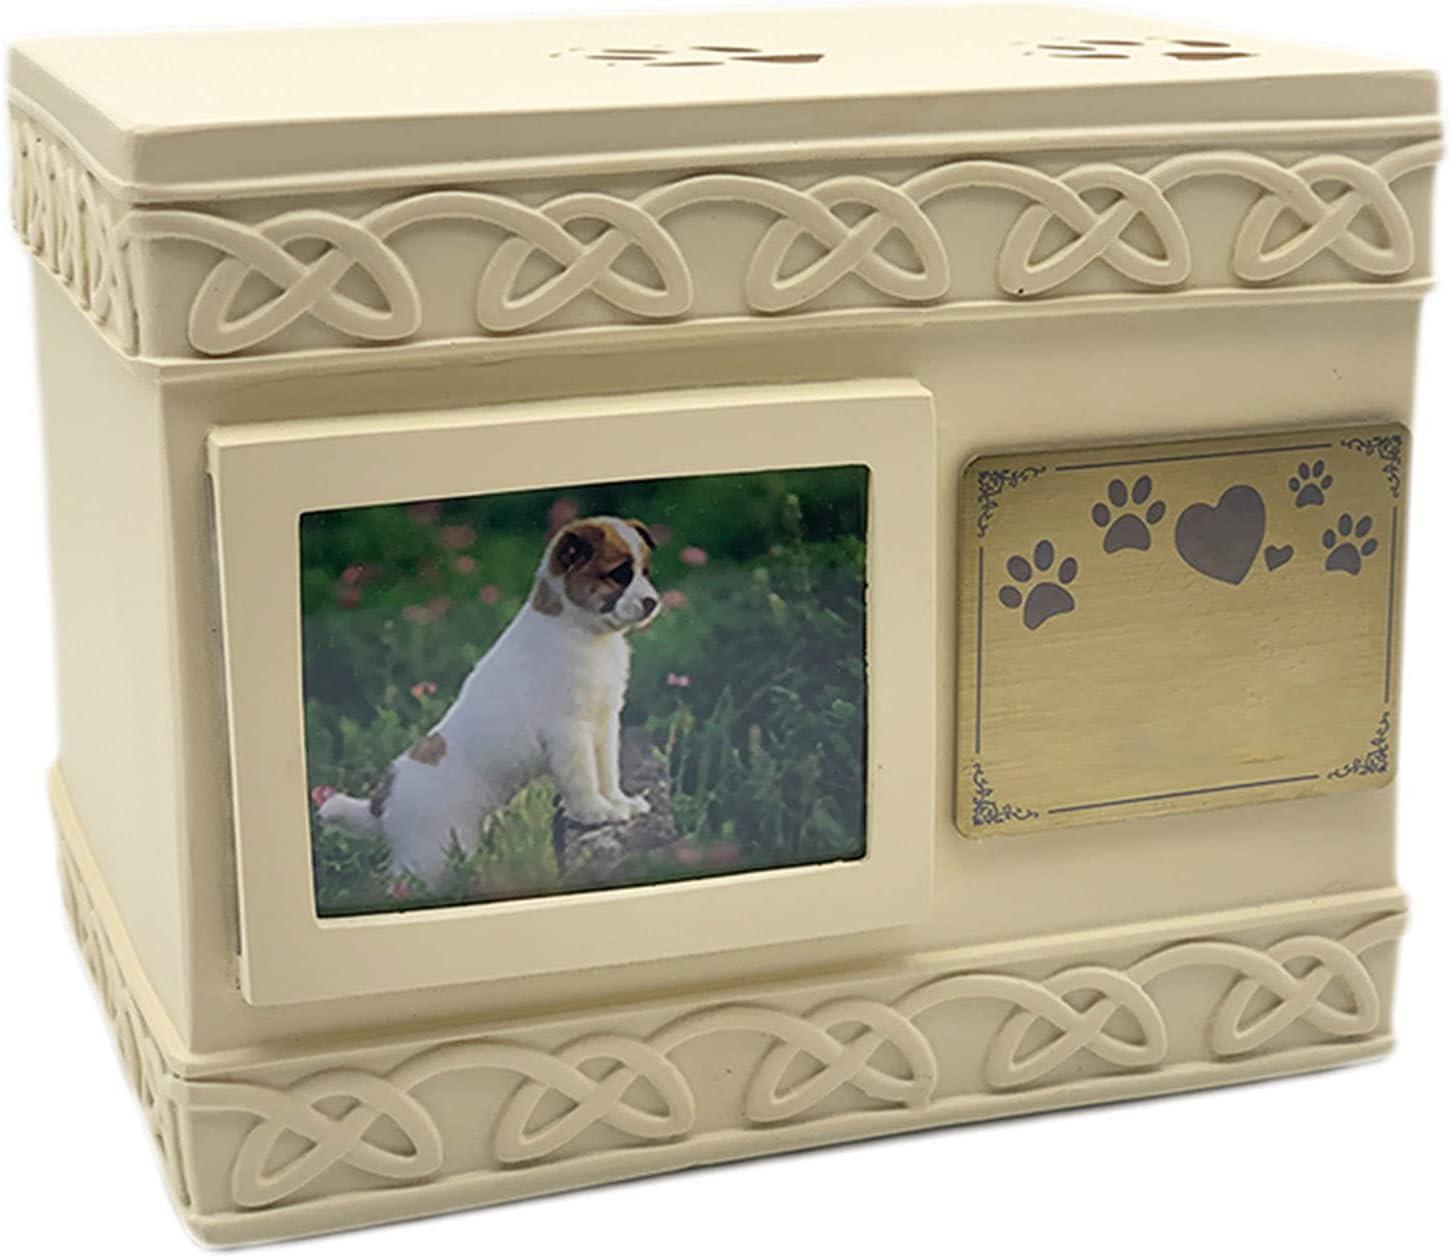 Urnas para Cenizas Mascotas, Ataúd Conmemorativo De Madera, Urnas Para Mascotas para Perros, Gatos, Caja para Urnas Funerarias para Mascotas Caja De Cremación para Mascotas con Grabado Personalizado